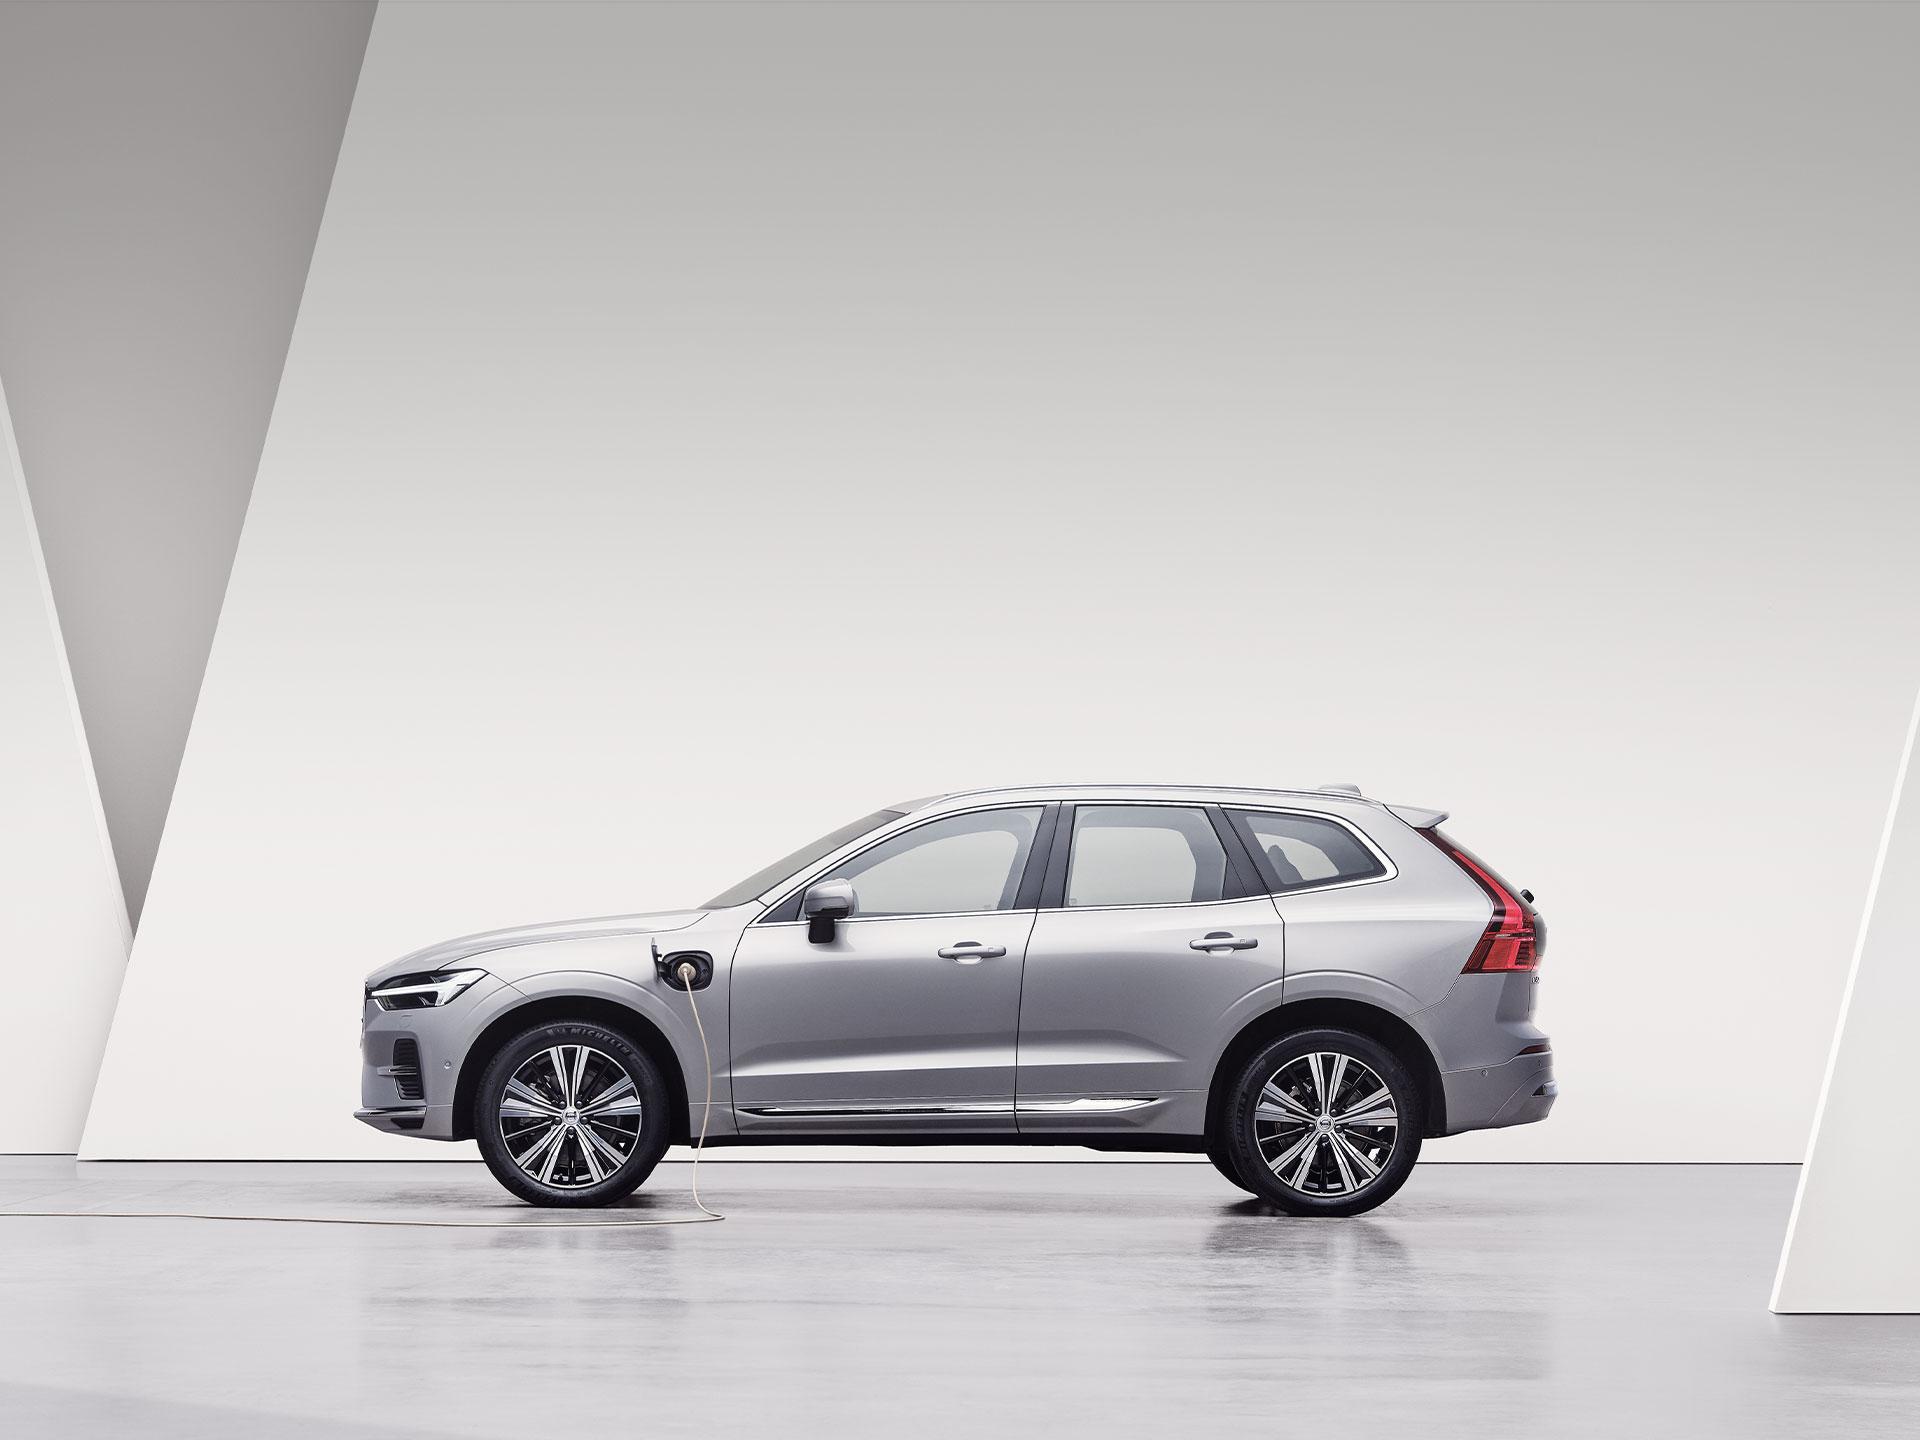 Srebrni Volvo XC60 Recharge se puni u beloj pozadini.